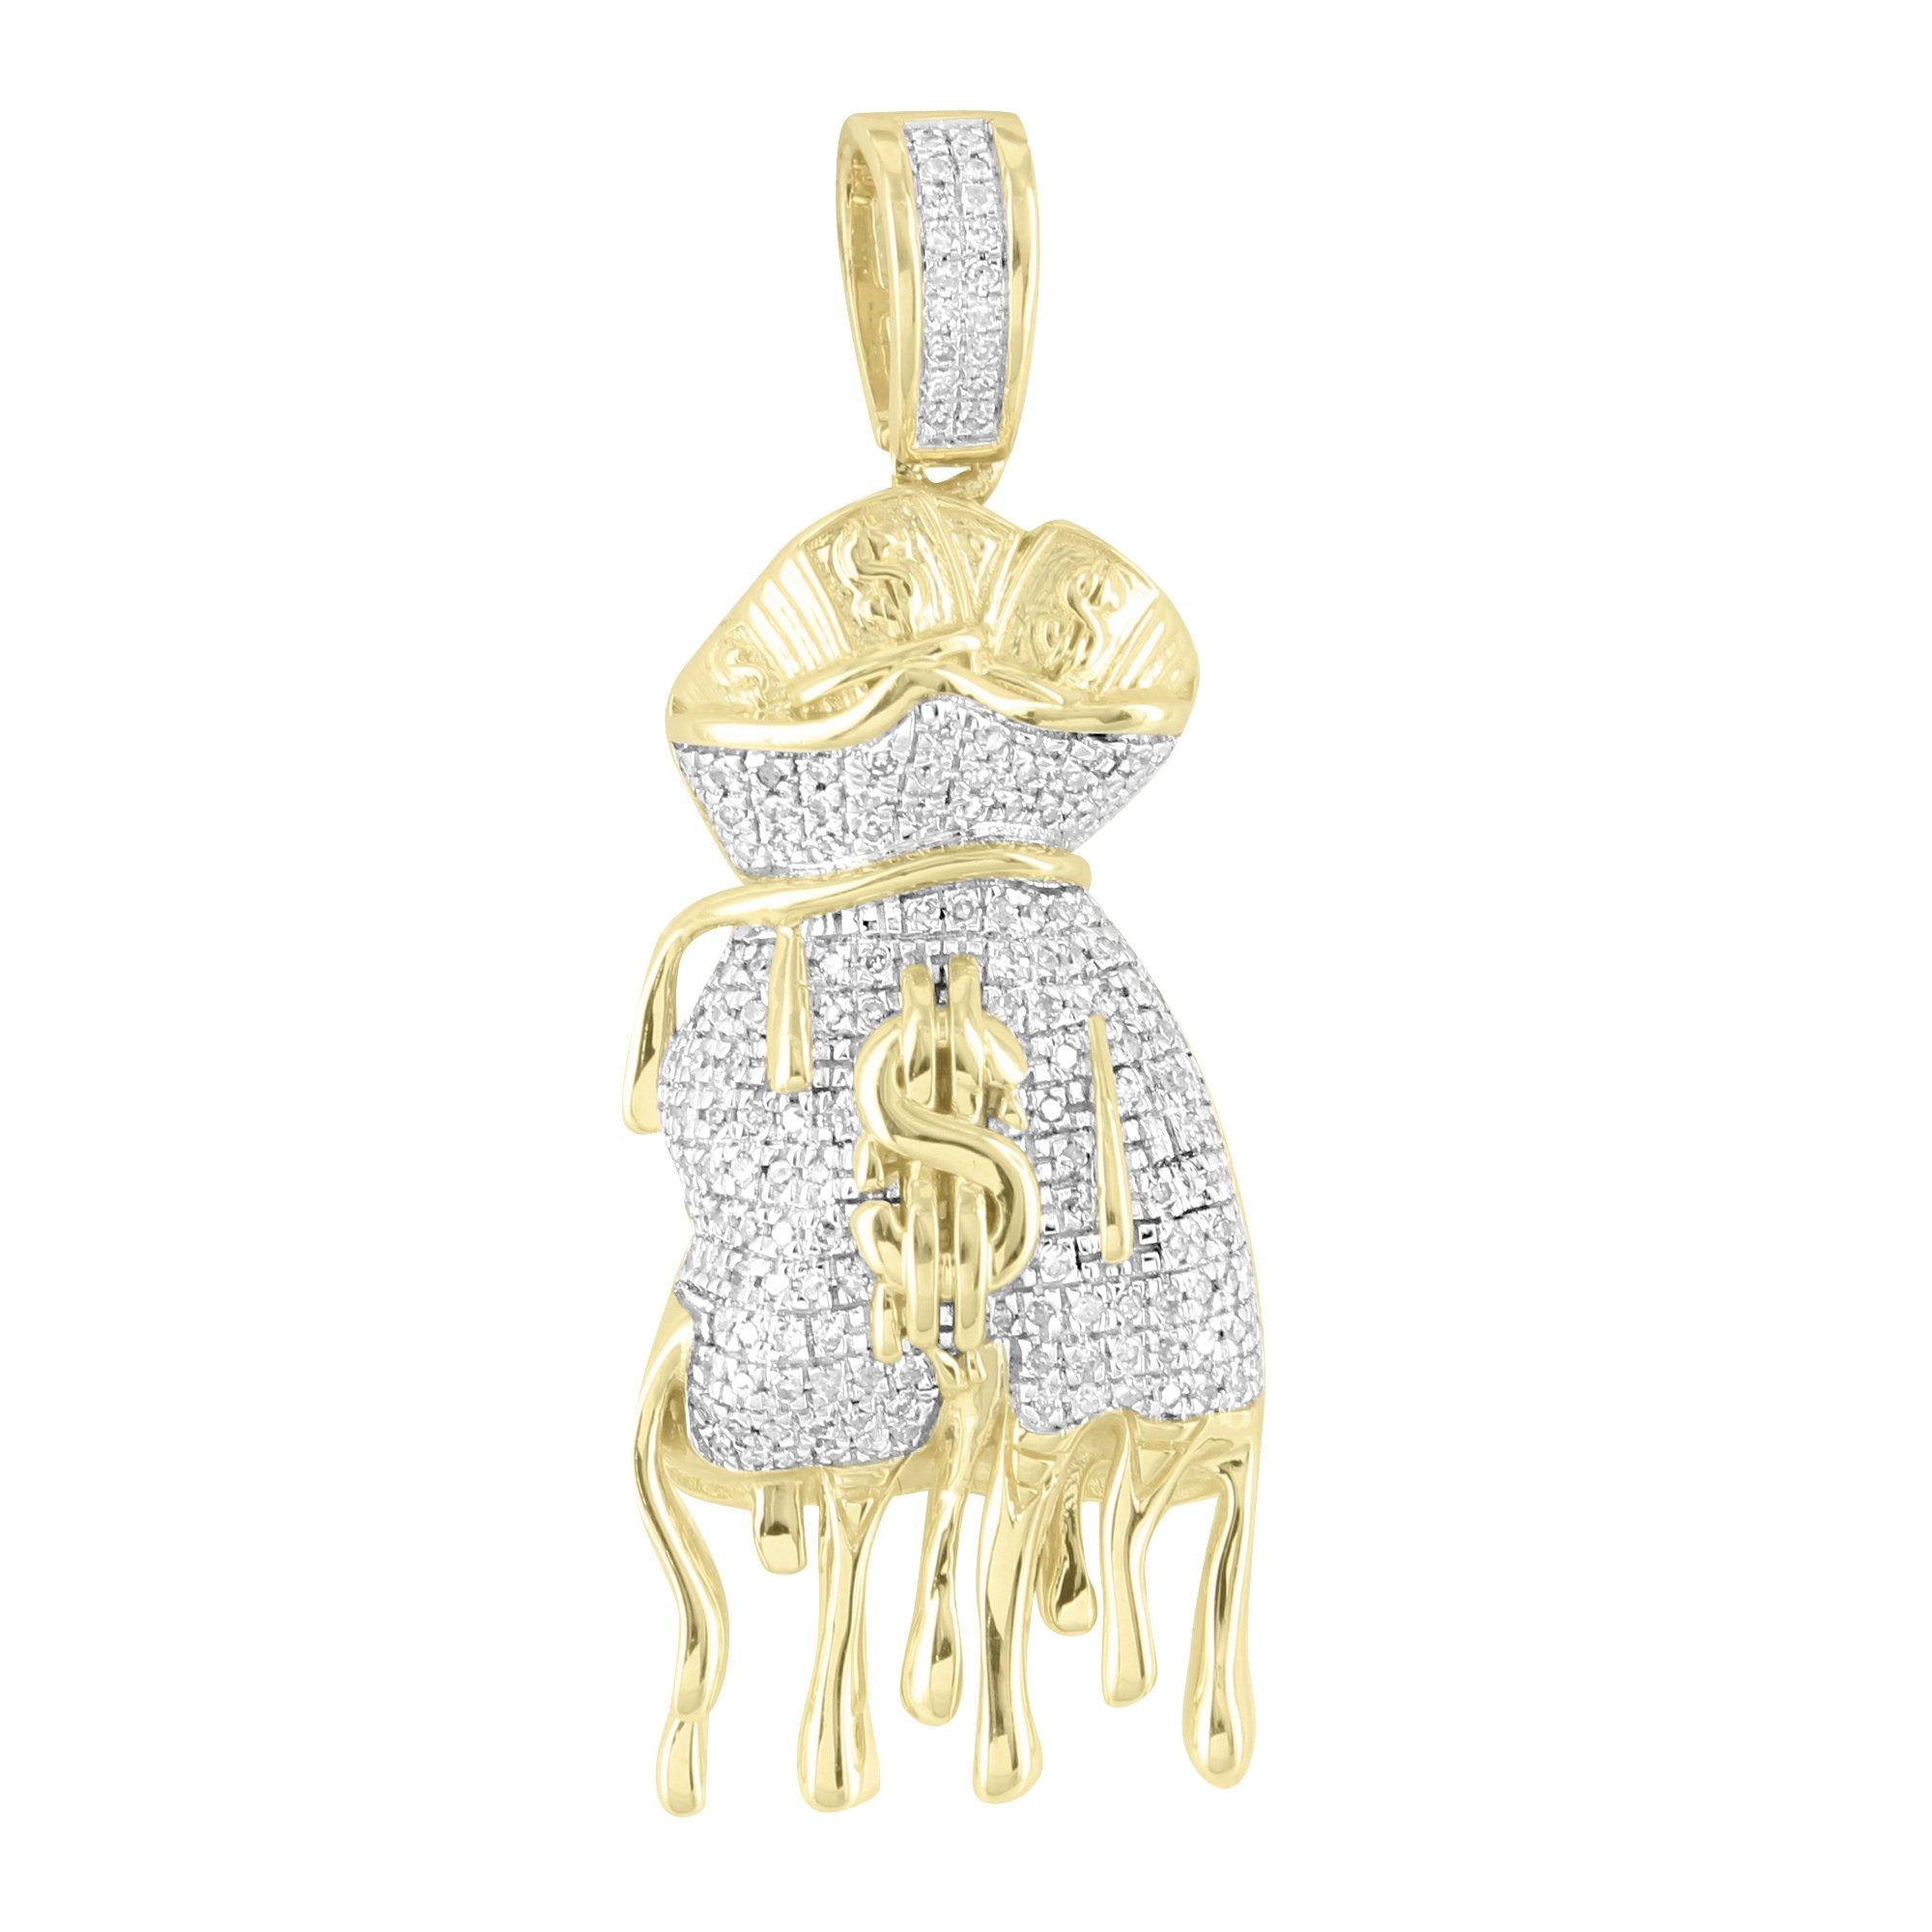 Dripping Money Bag Pendant Custom 10k Yellow Gold 0.50 Ct Diamonds Rapper Pave Set